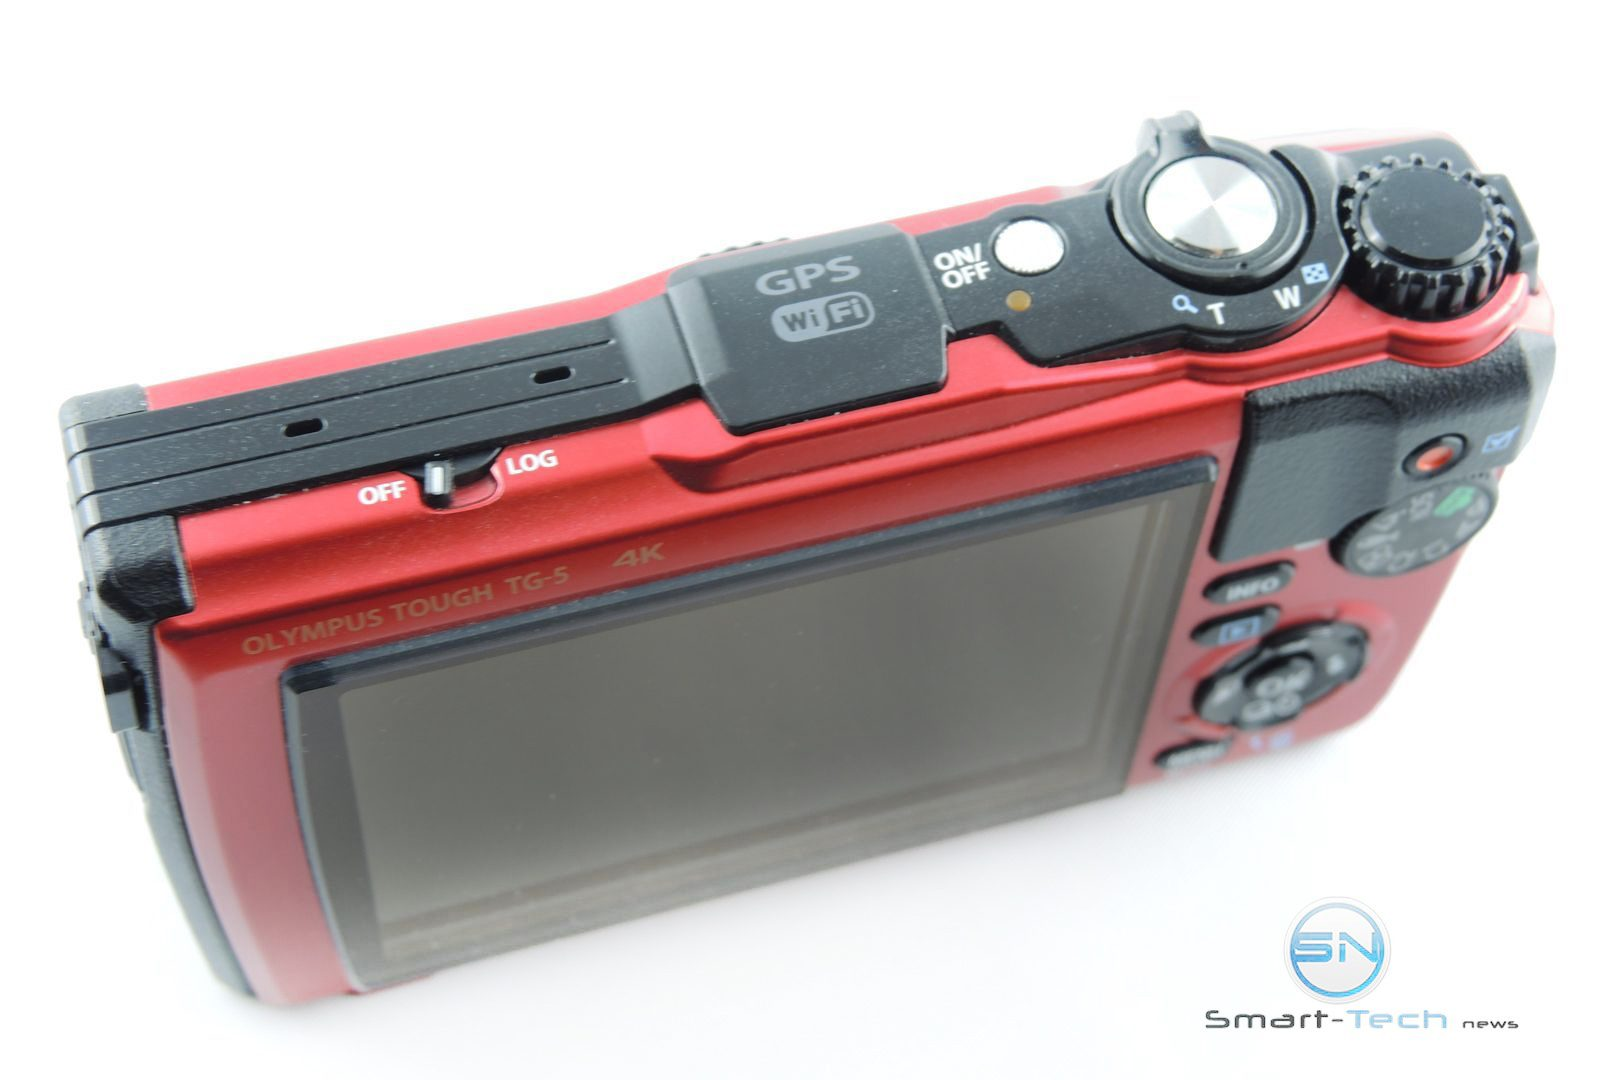 GPS Power Olympus TG 5 die Outdoor Kamera - SmartTechNews